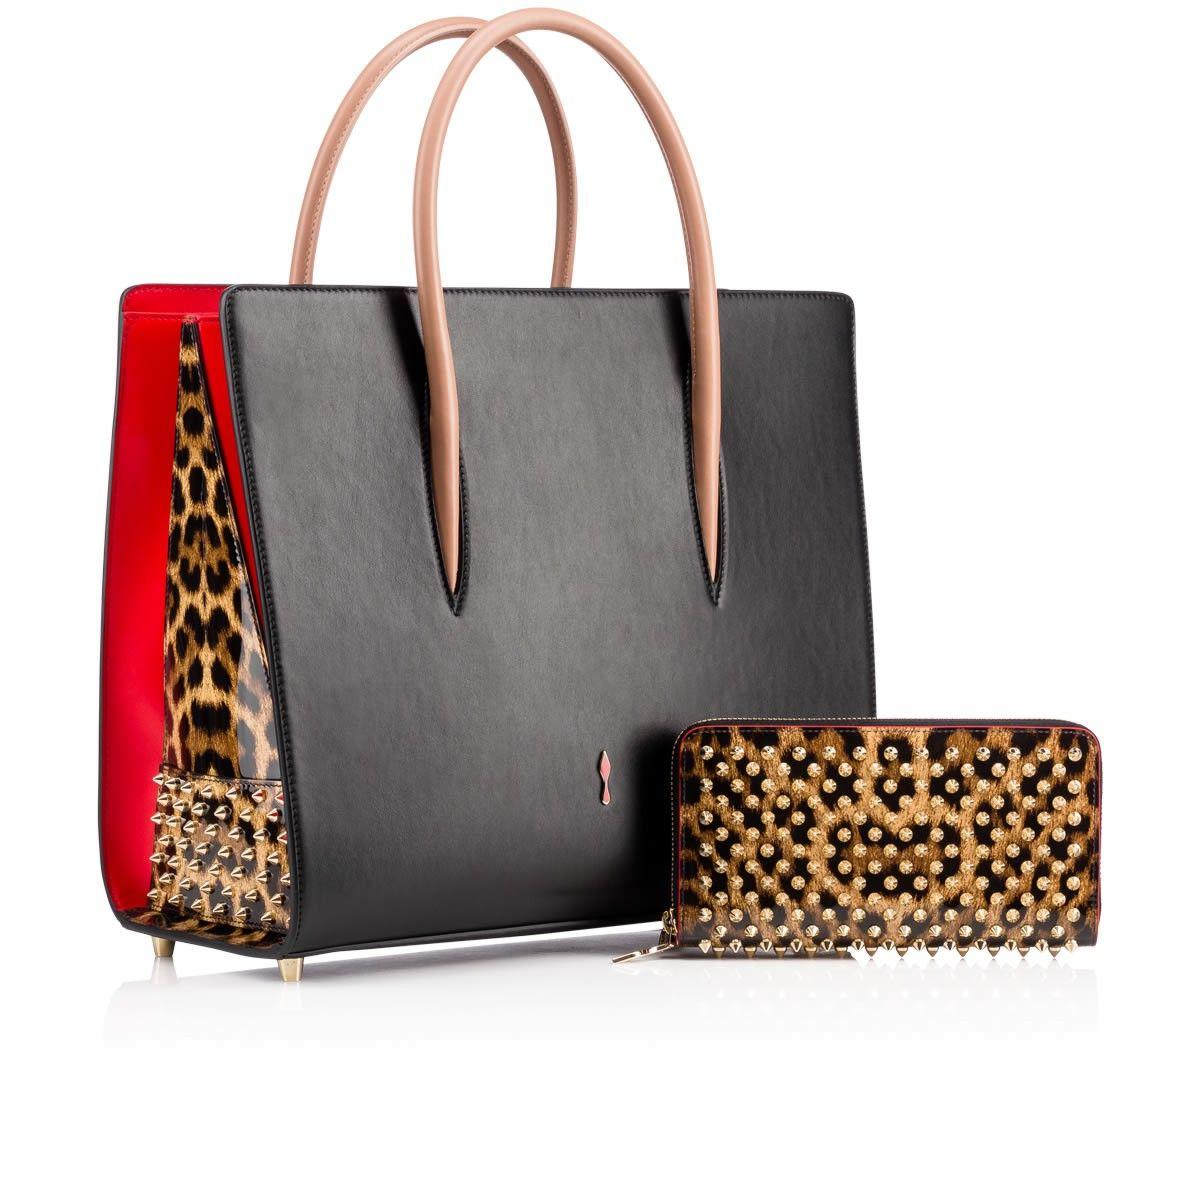 5f1e668fb81 Bags - Paloma Large Tote Bag - Christian Louboutin | Christian ...